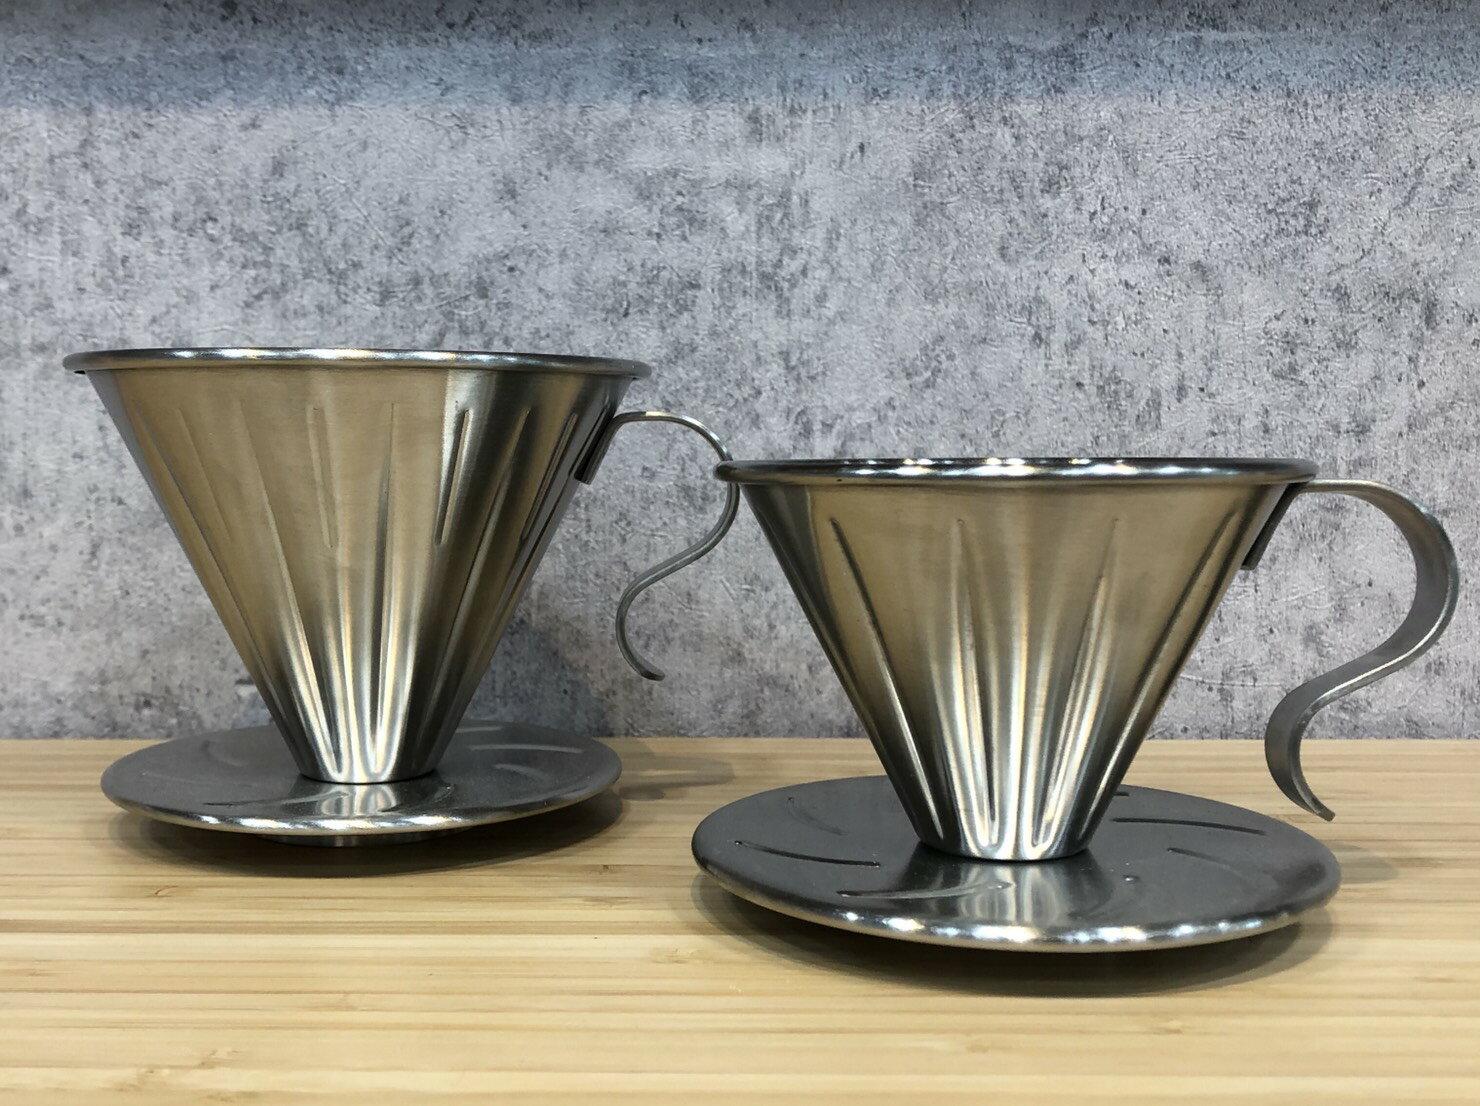 MILA 304不鏽鋼手沖咖啡濾杯 V60錐形『93 coffee wholesale』